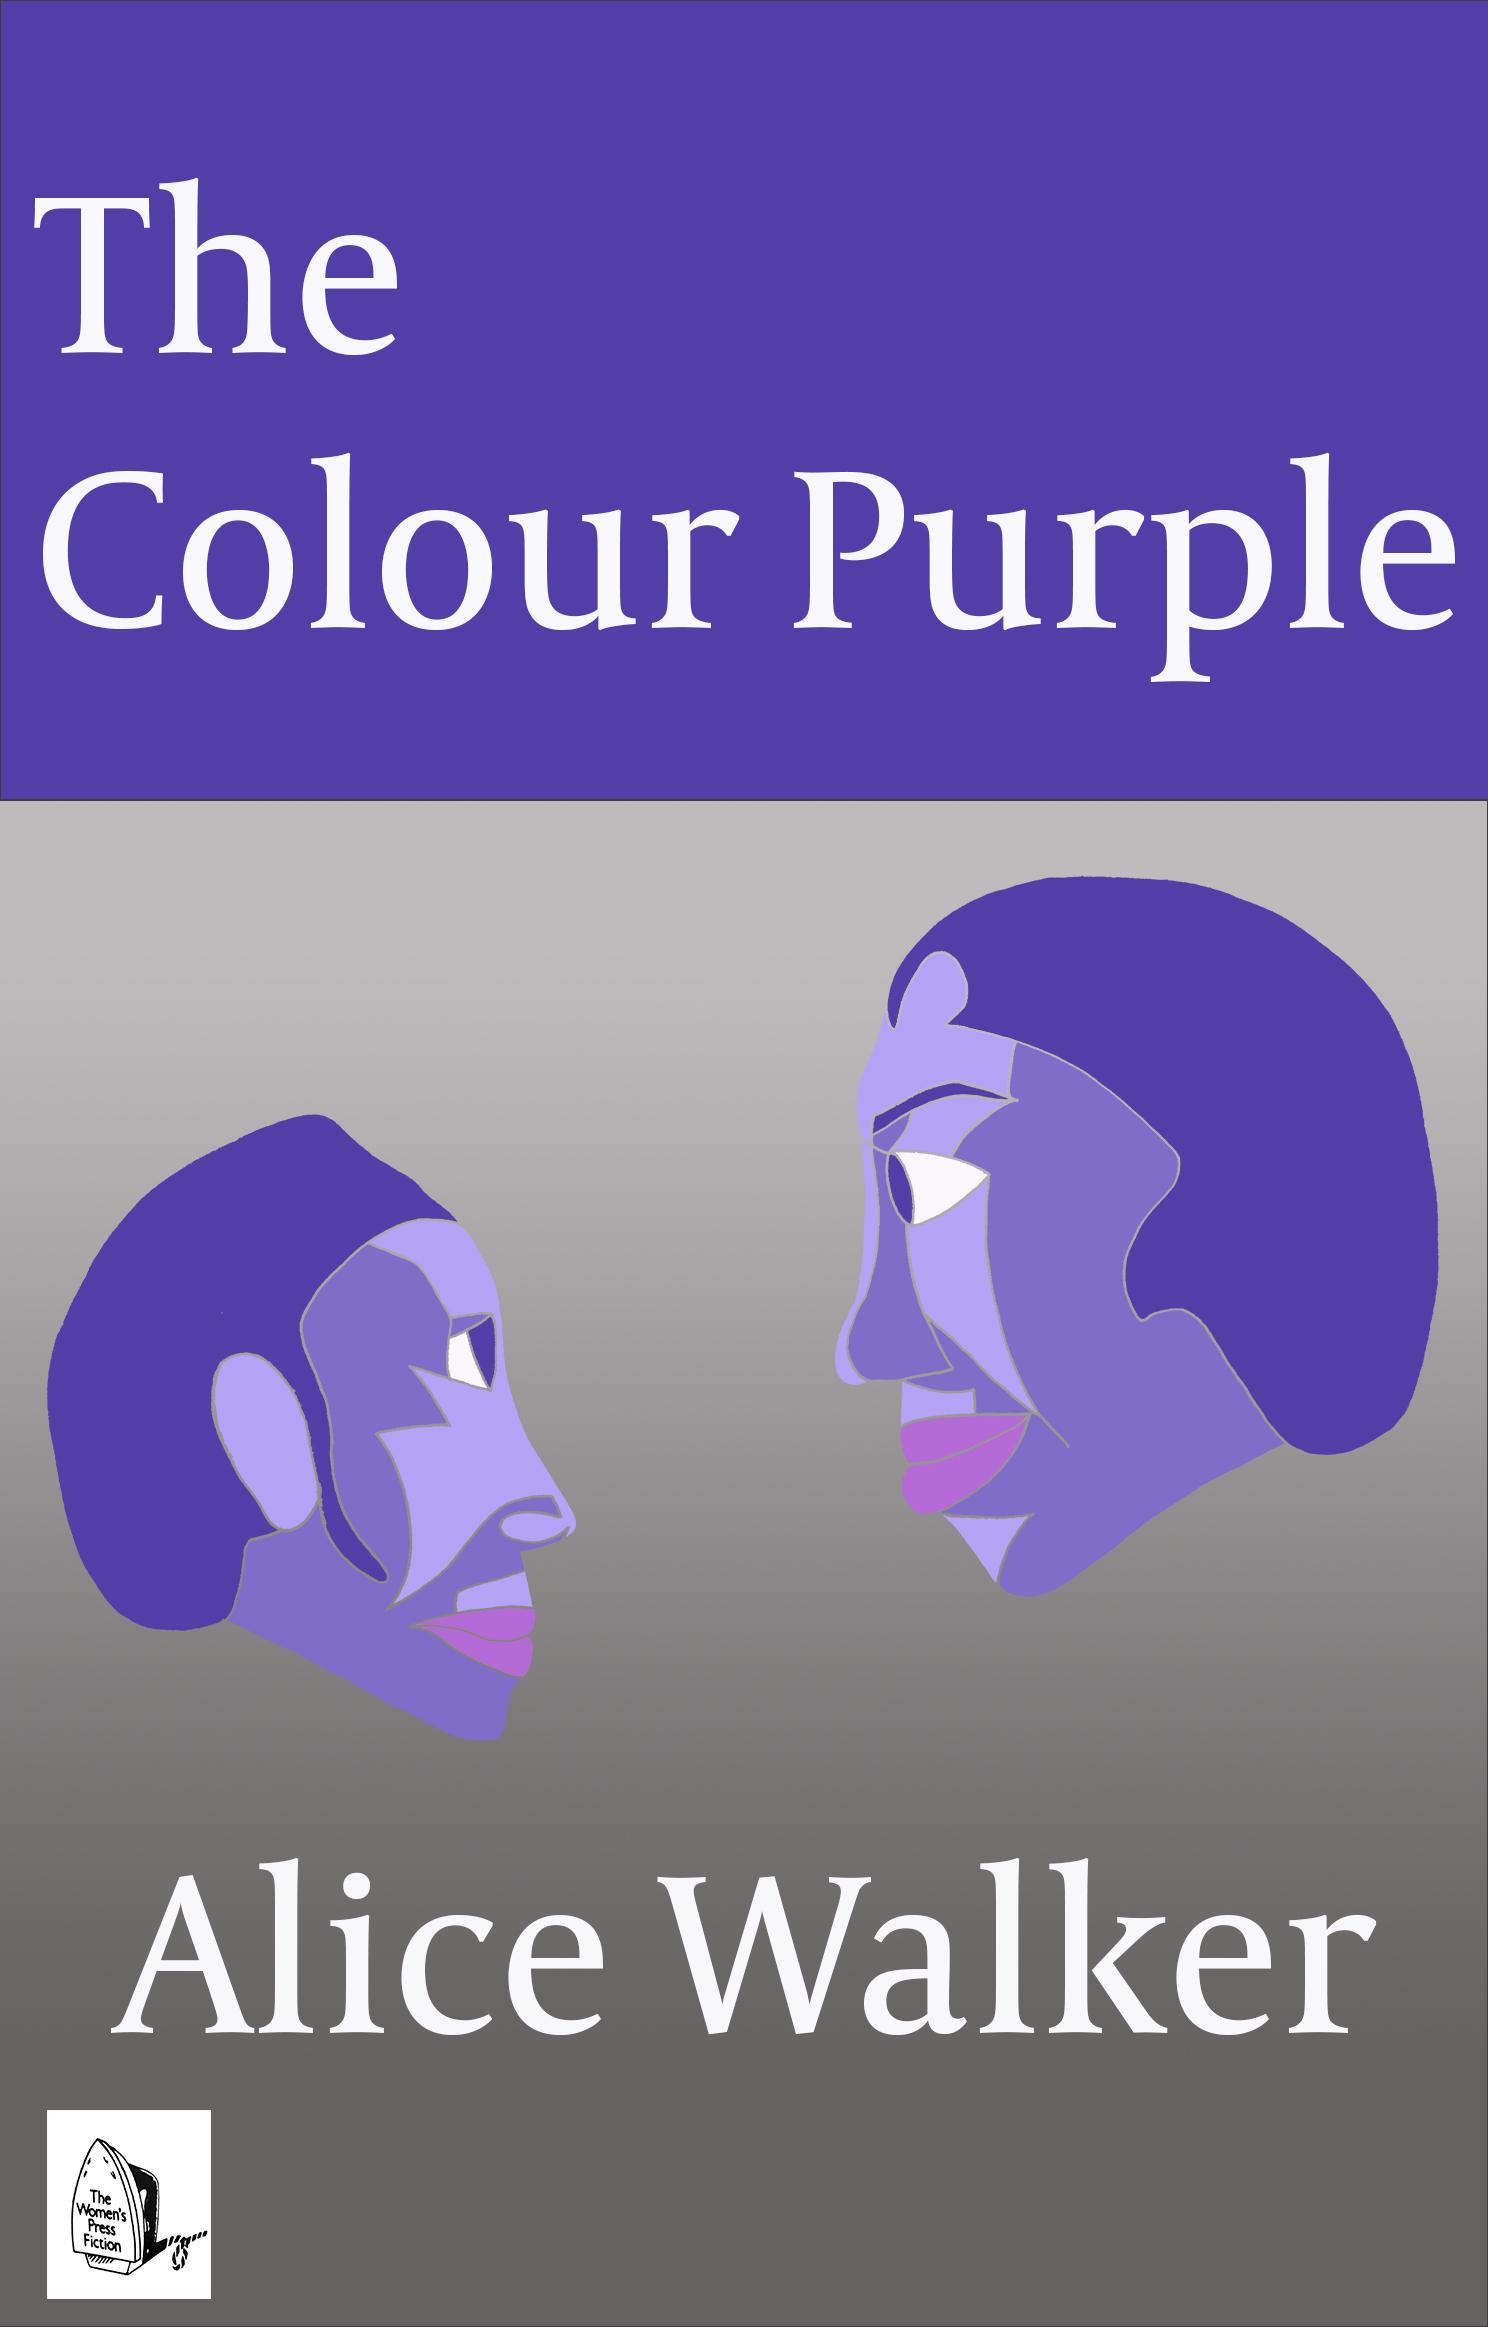 The colour purple cover 1.jpg